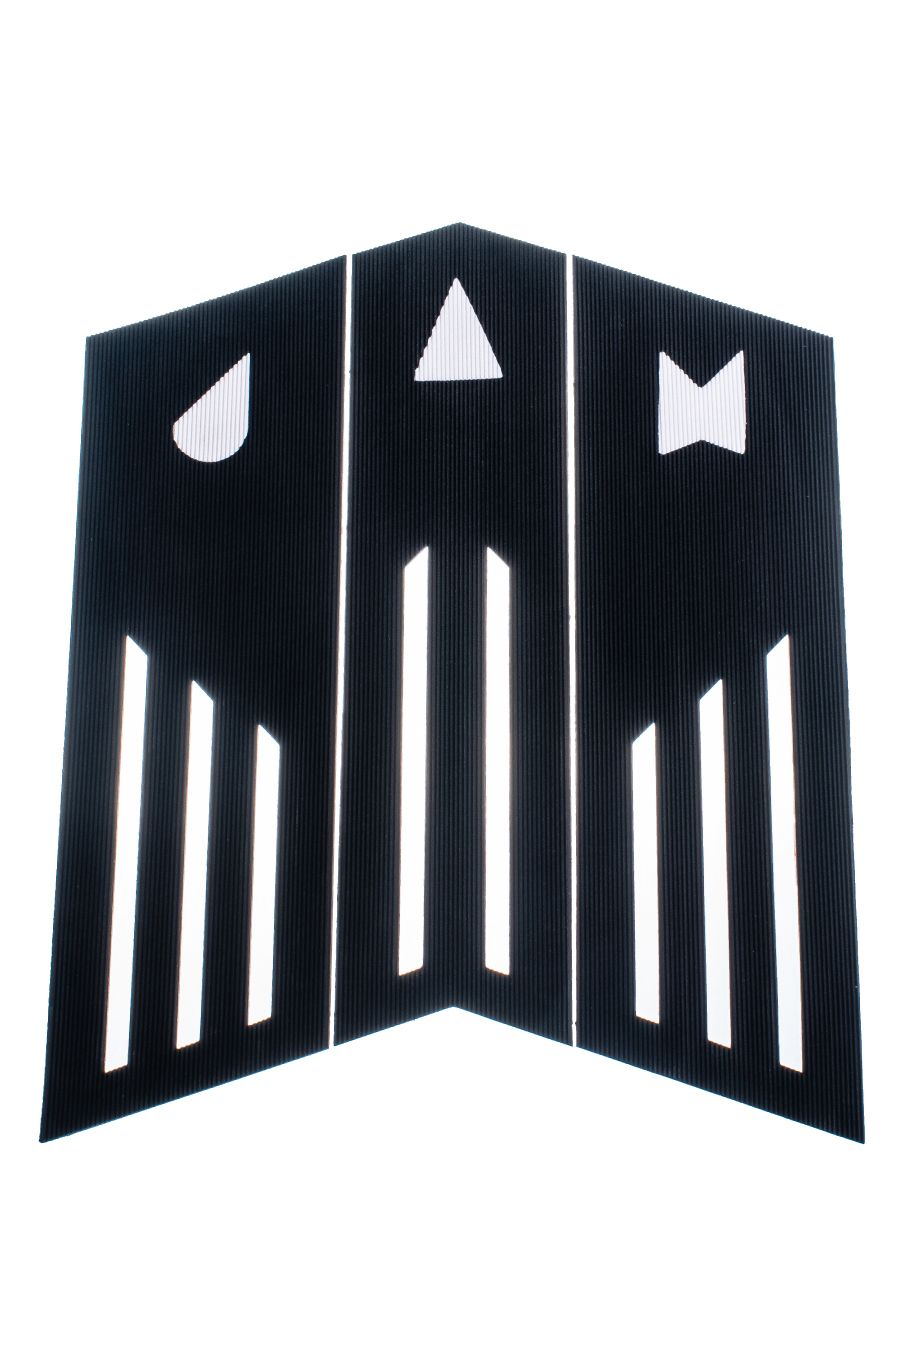 Jam Deck FRONT PAD 3 PIECE Black/White